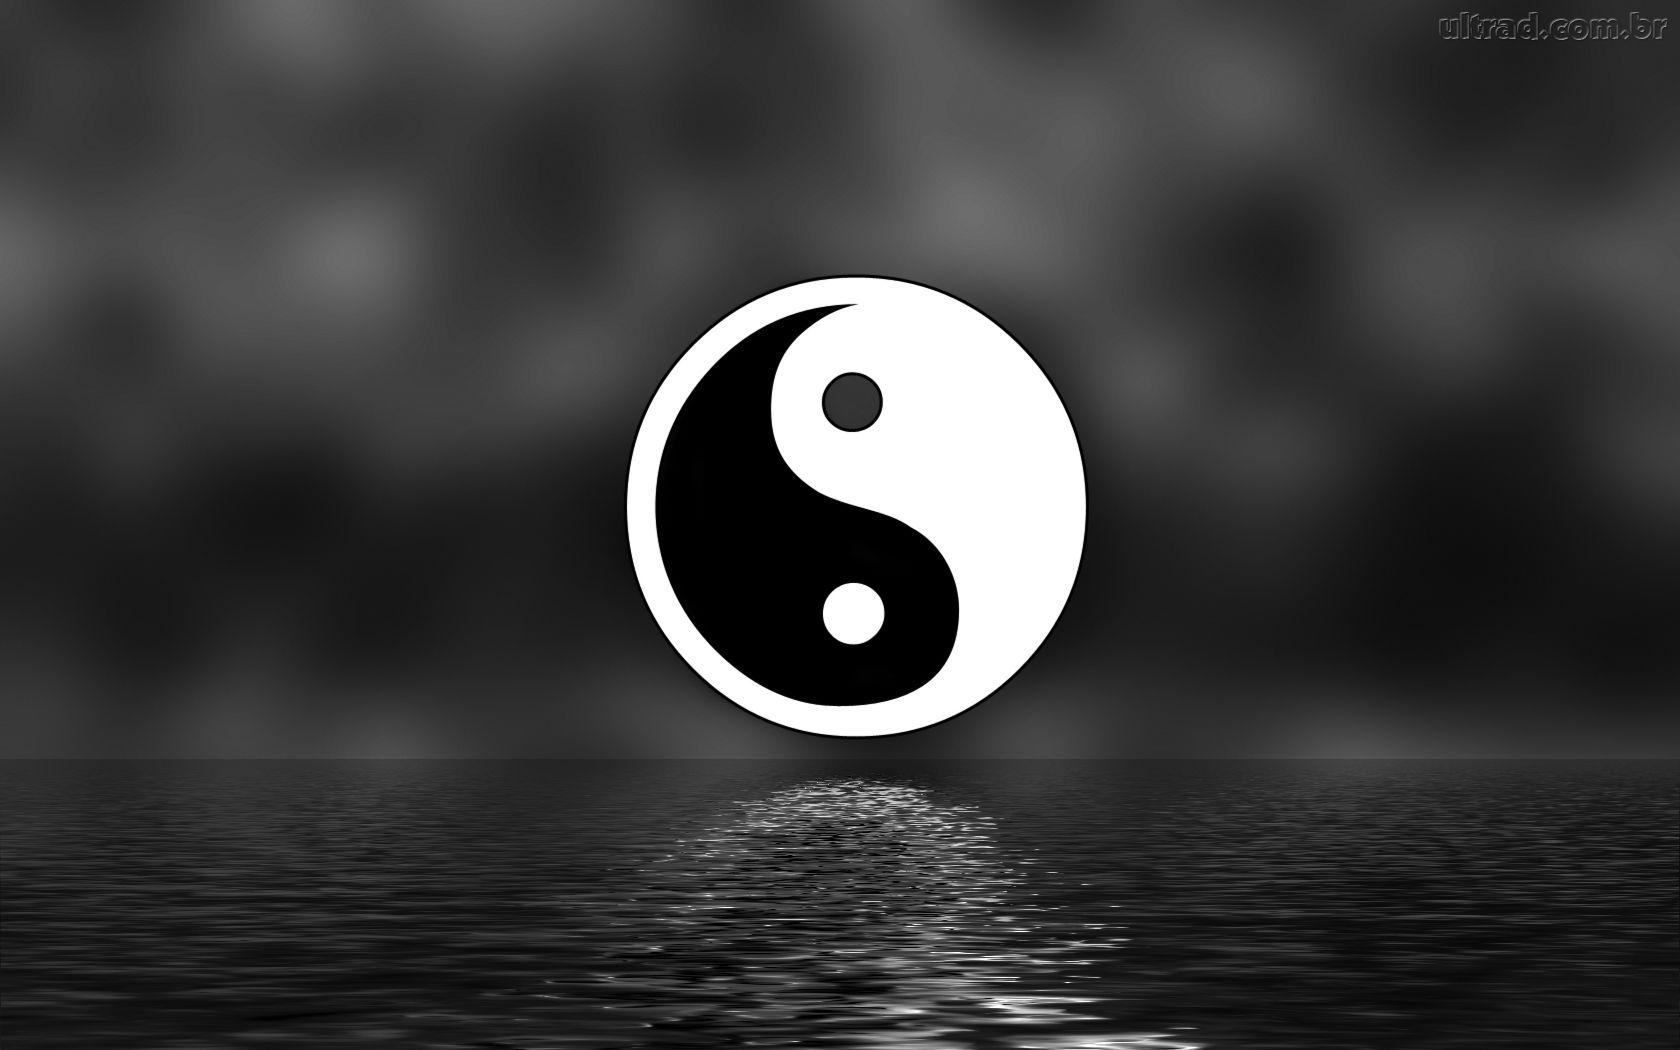 ... ying yang papel de parede ying ang imagens tigre branco wallpaper